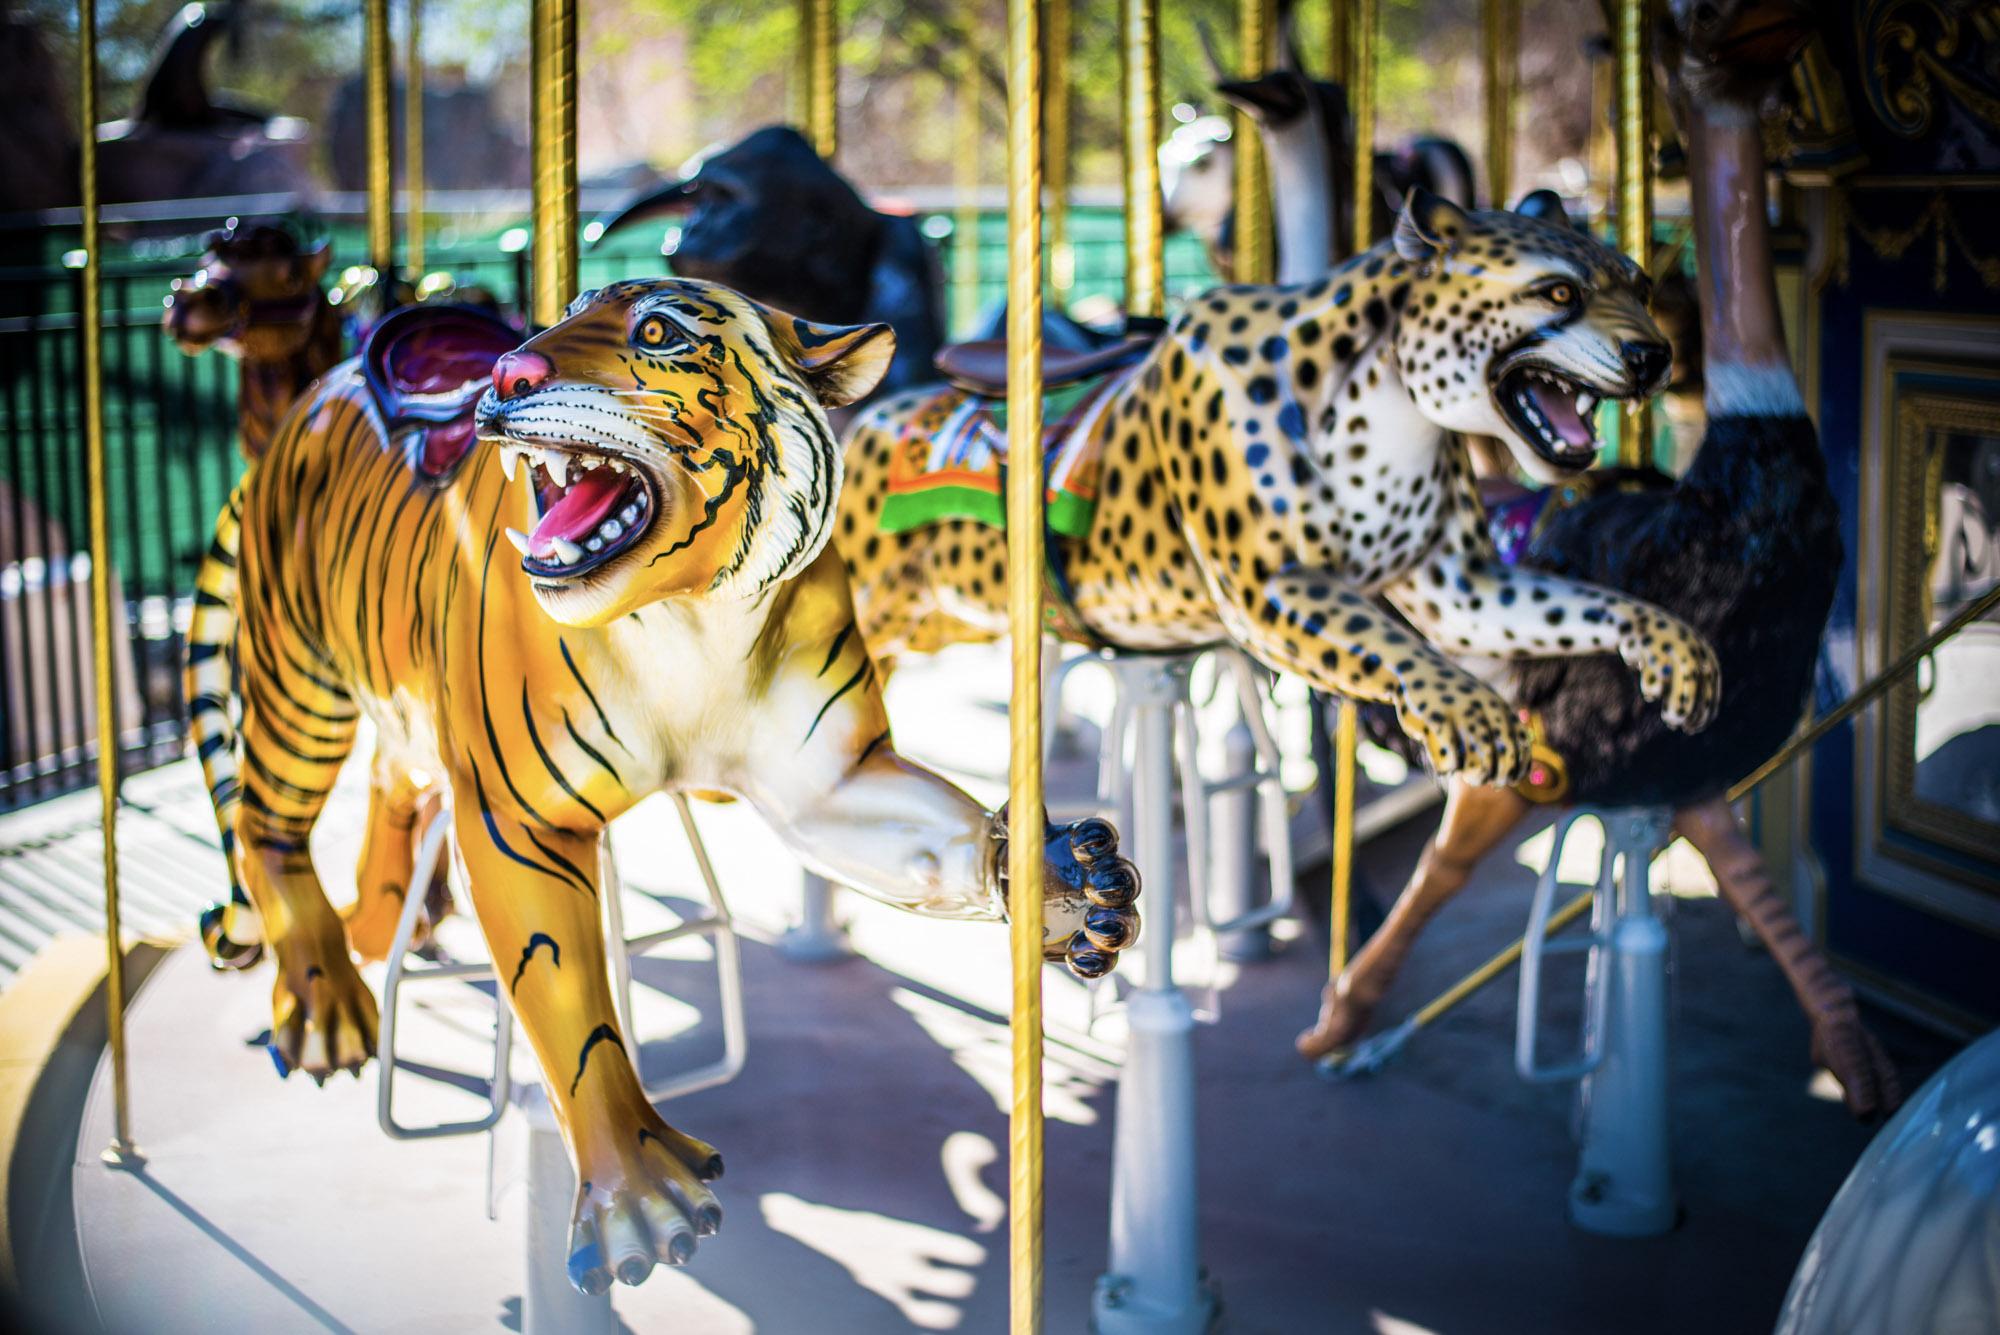 carousel_Conrad Doborski_1558544921072.jpg.jpg